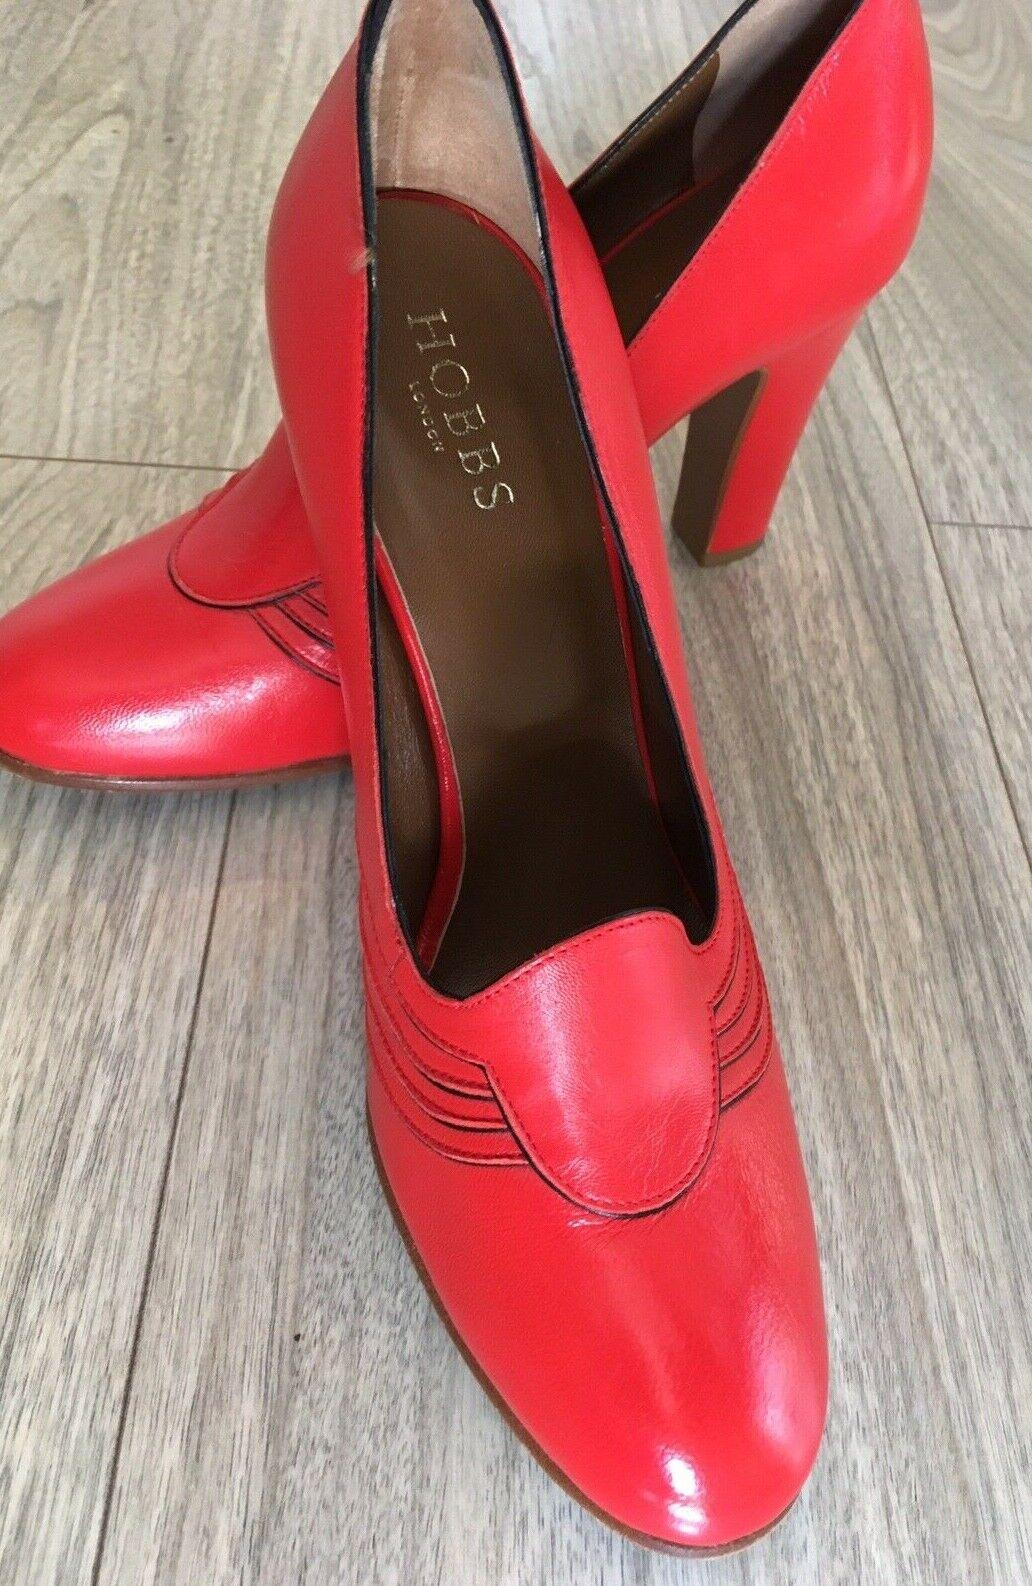 NEW HOBBS Italian Leather Orange High Heeled Court schuhe Größe 6.5 EU 40